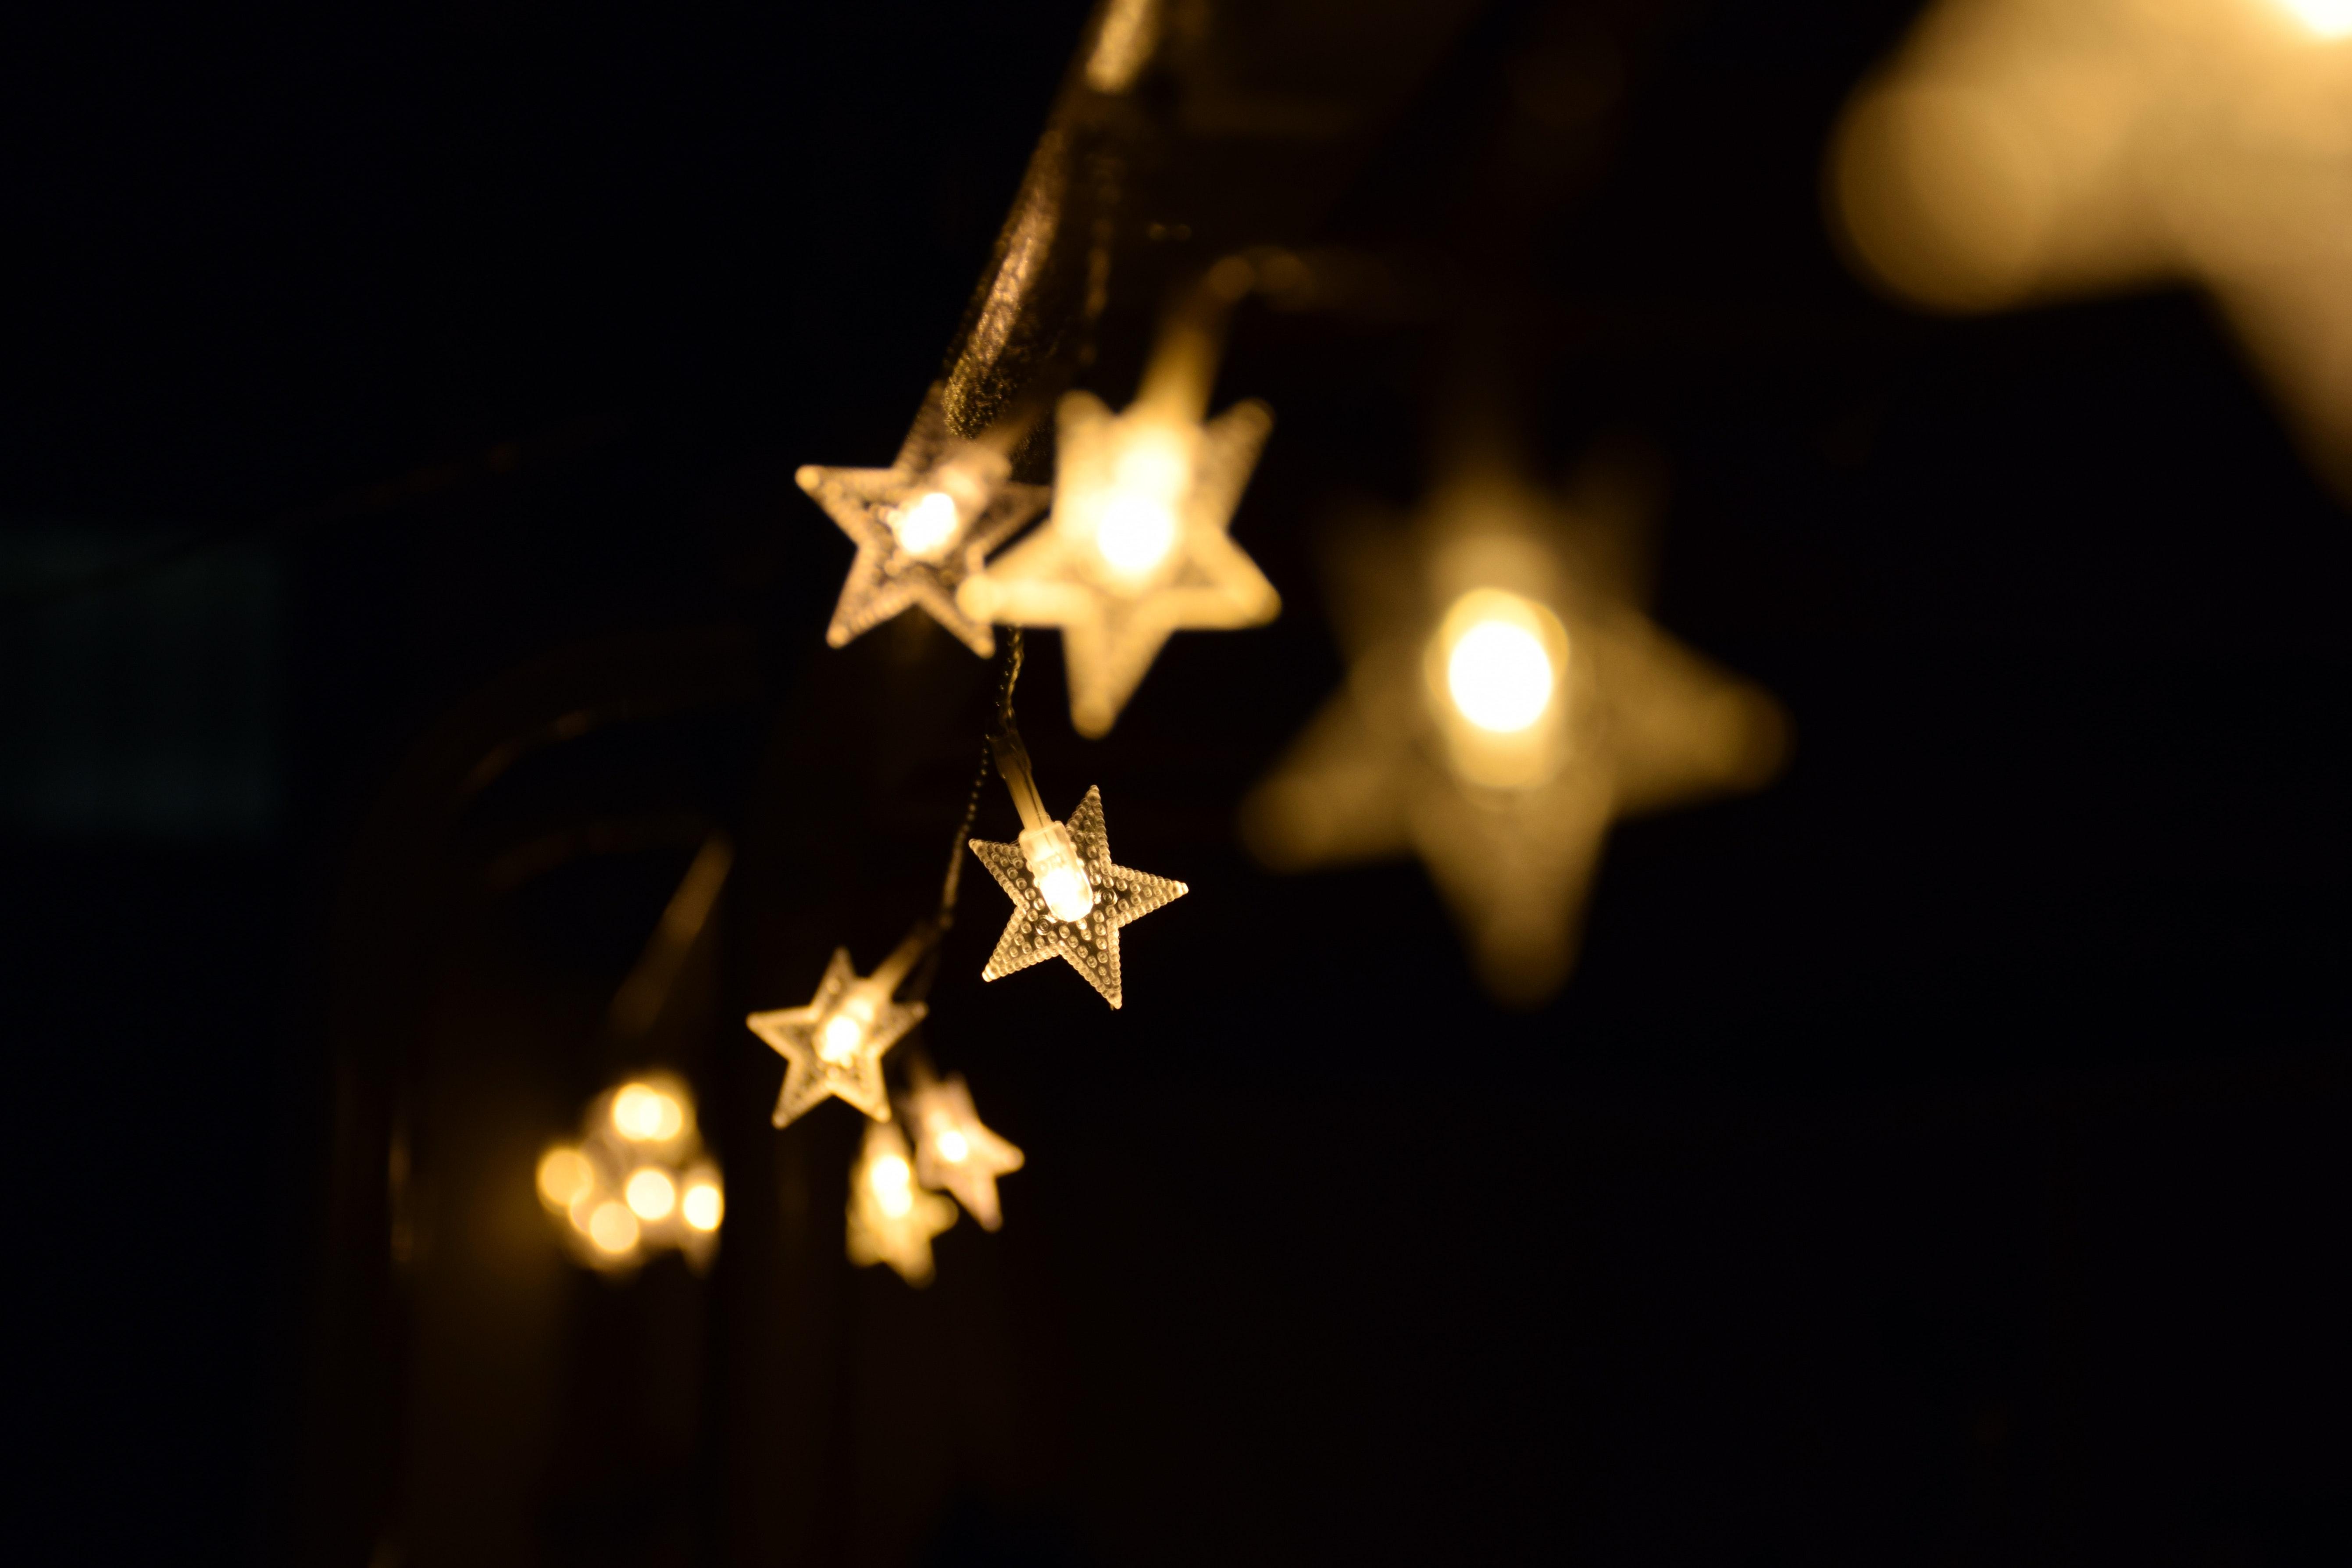 shallow-focus-photography-of-yellow-star-lanterns-980859